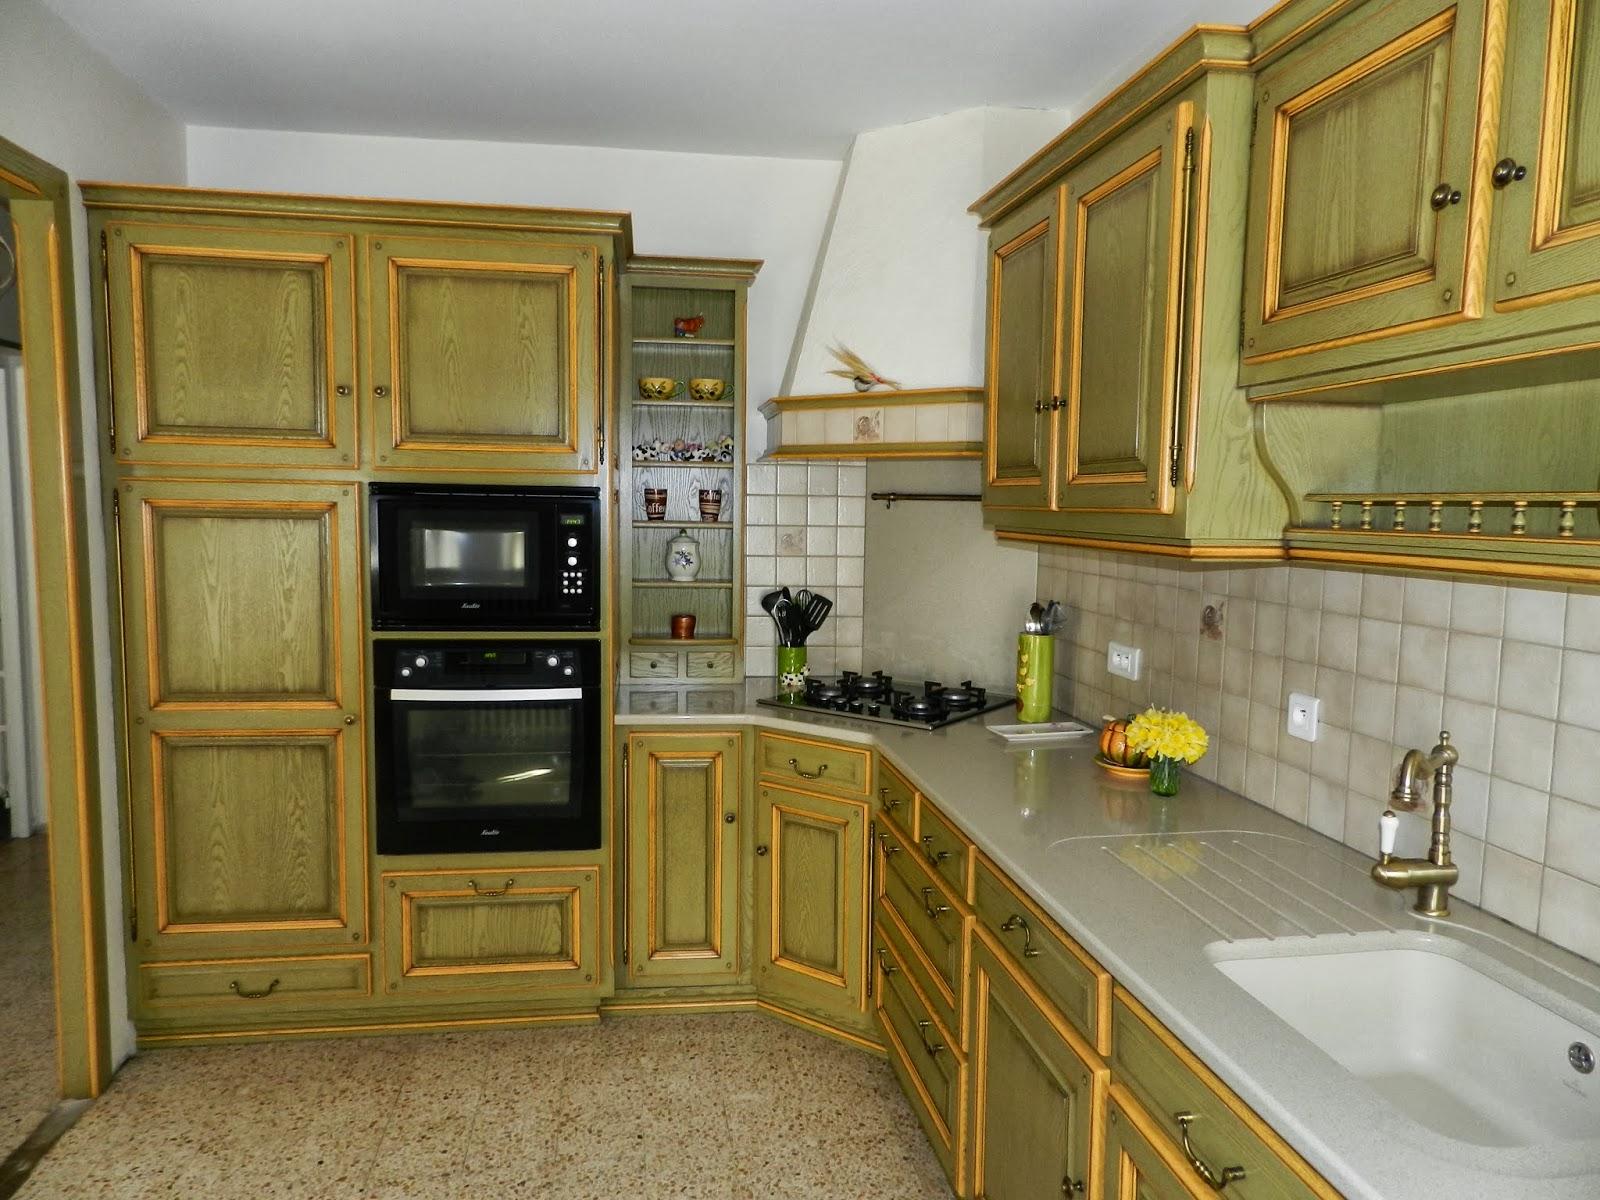 artisan fabricant de cuisine cantal auvergne cuisiniste meubles de cuisine sur mesure. Black Bedroom Furniture Sets. Home Design Ideas